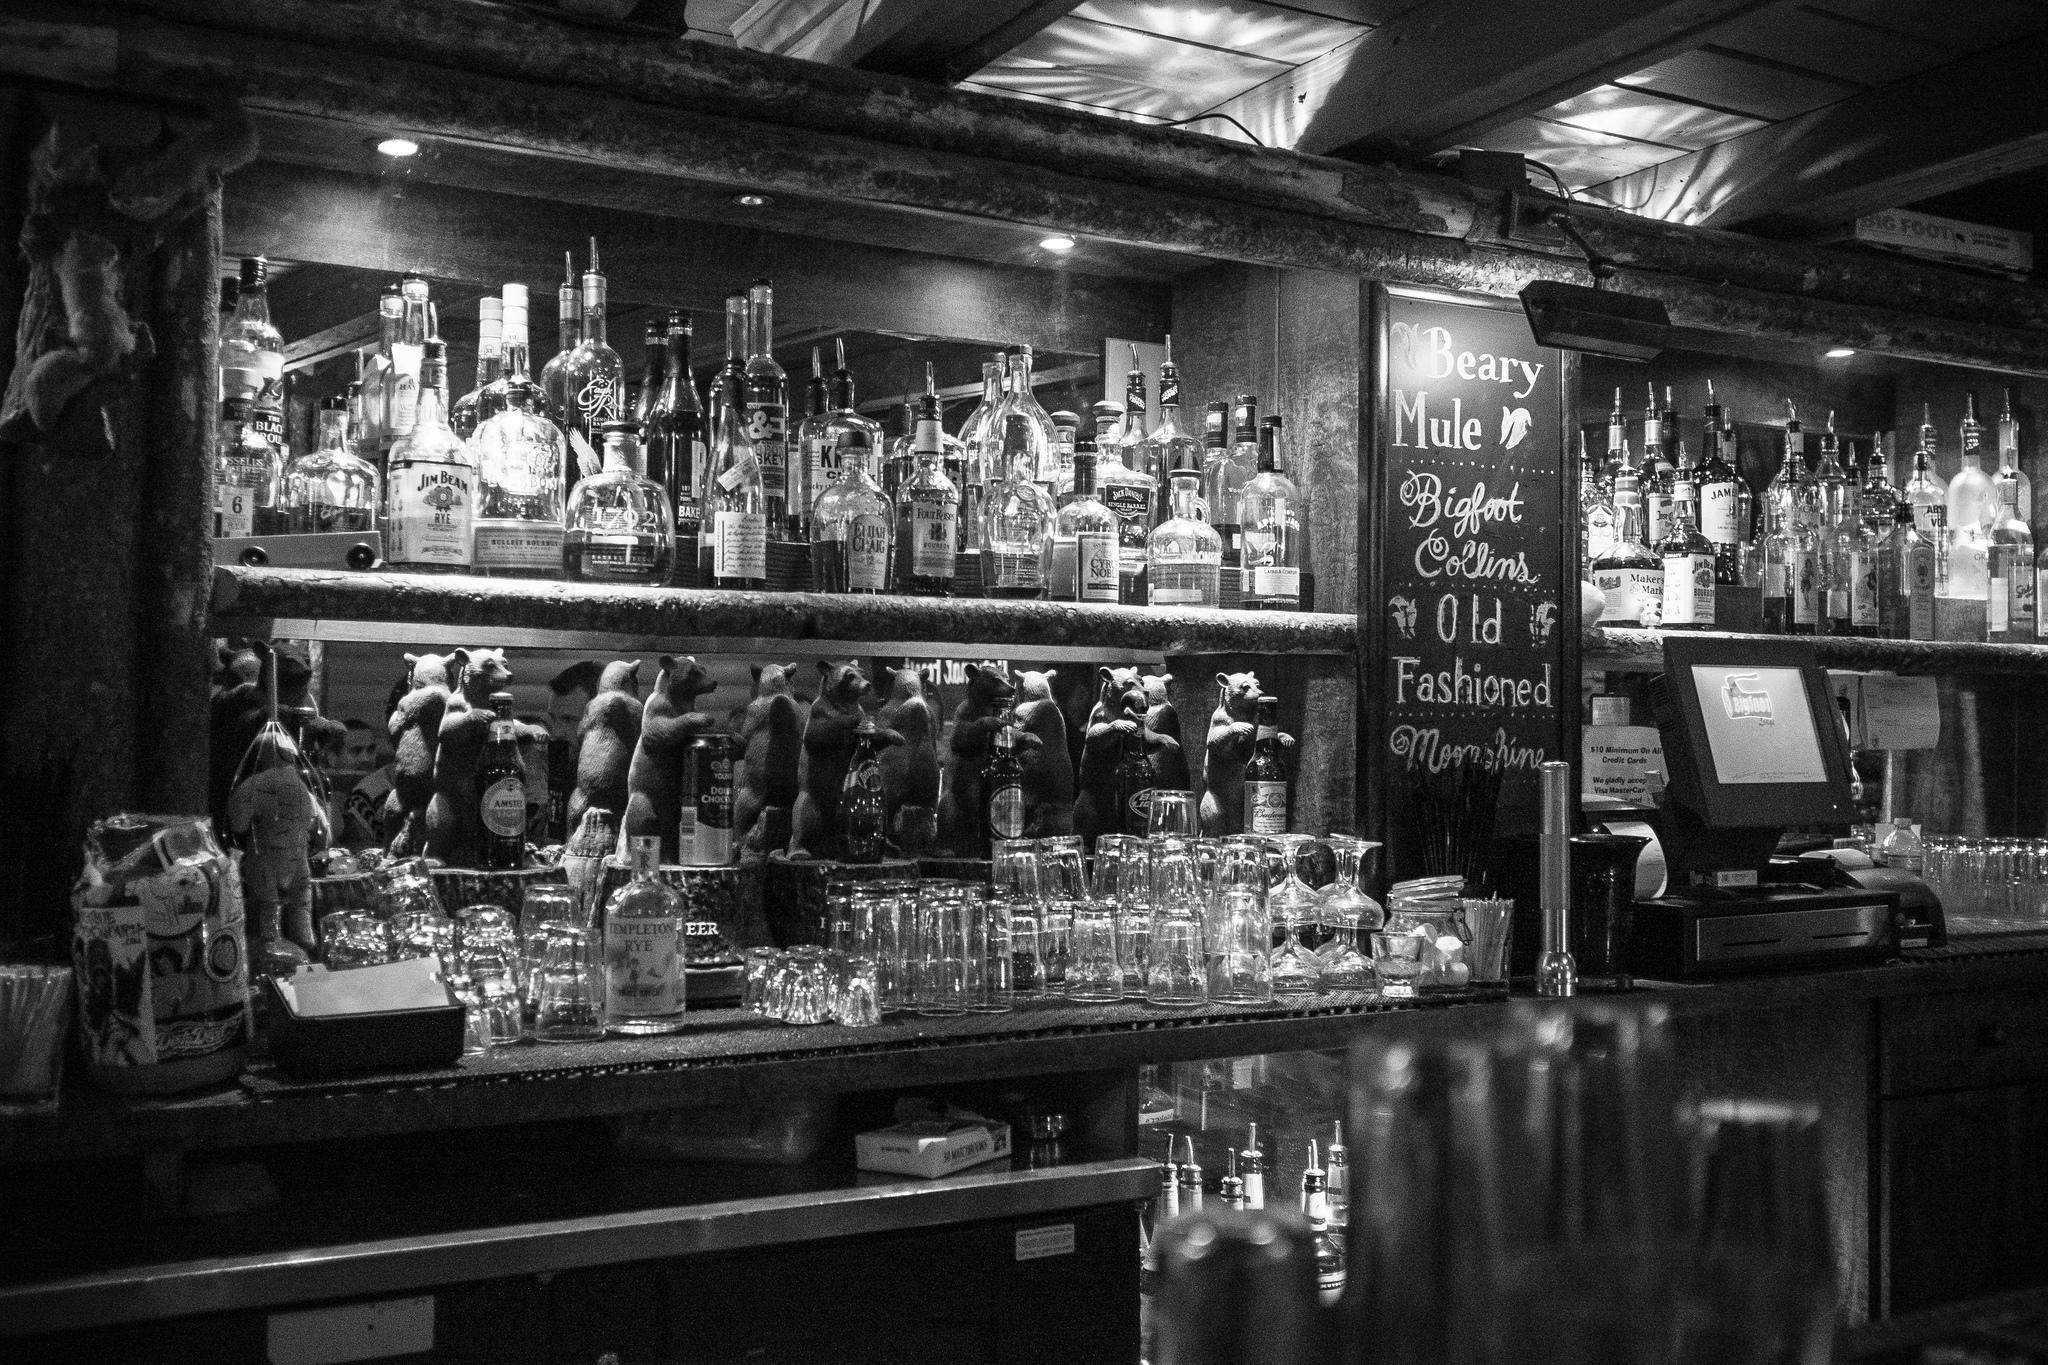 black & white photo of a stocked bar